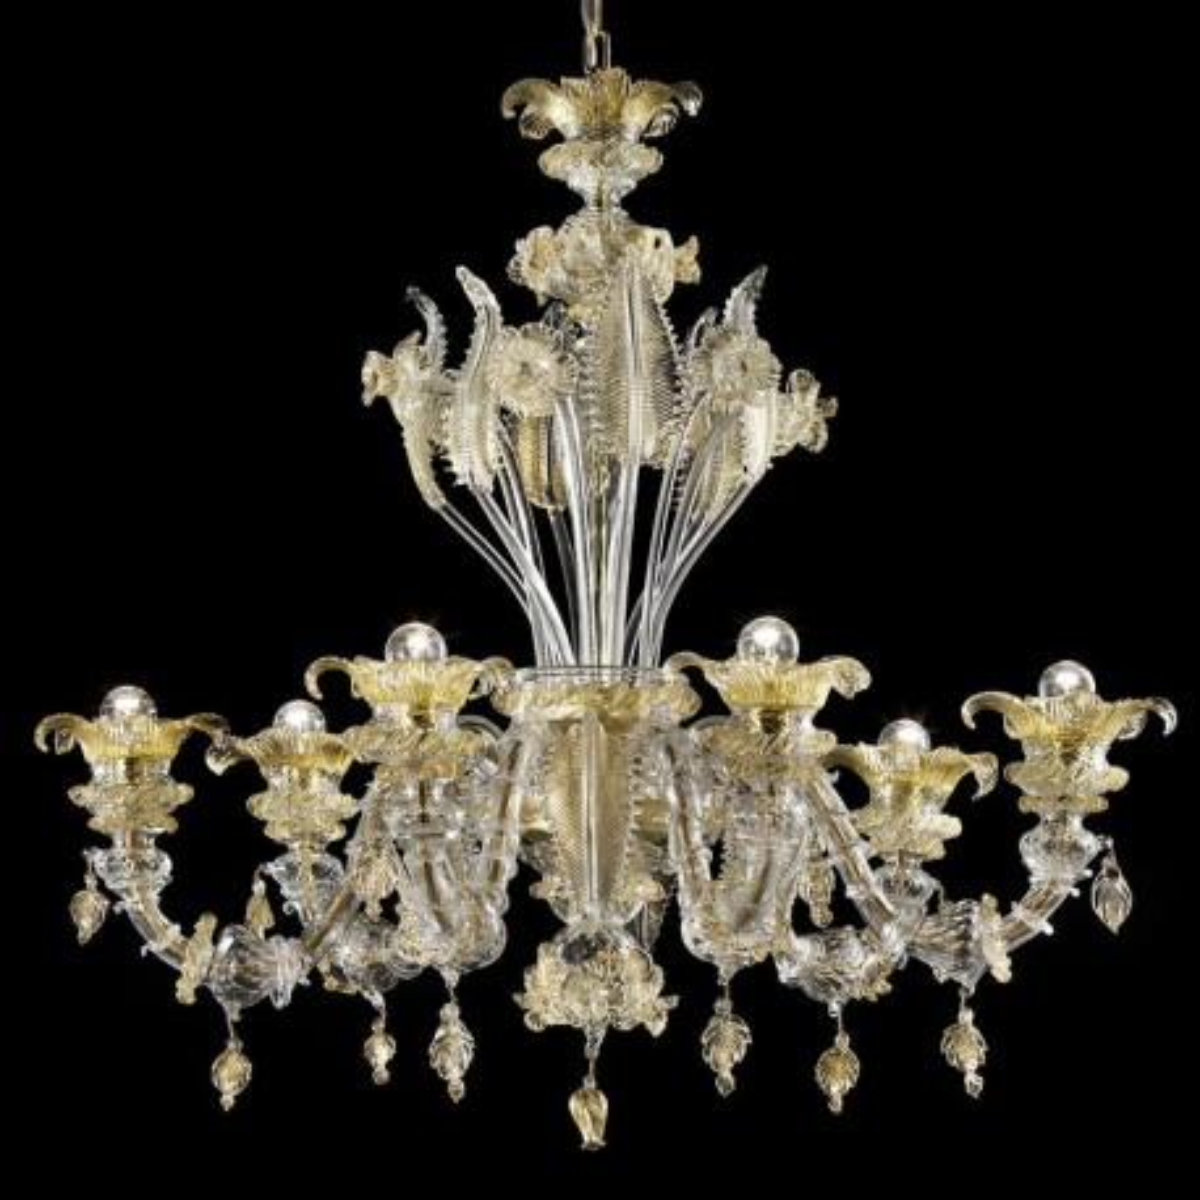 Prezioso 6 lights Murano glass chandelier - transparent gold color